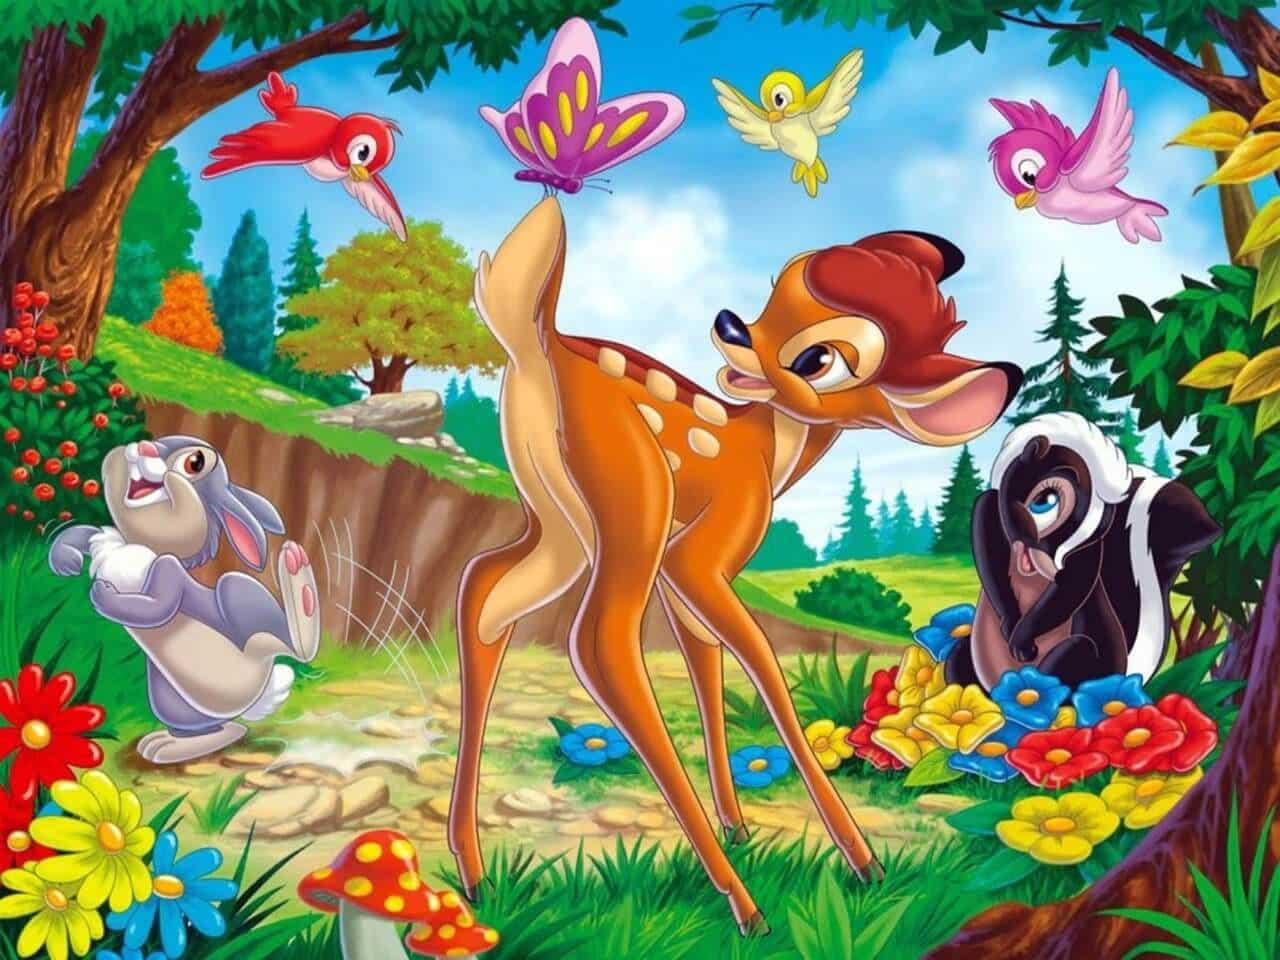 Bambi: 14 curiosità da sapere sul film danimazione disney